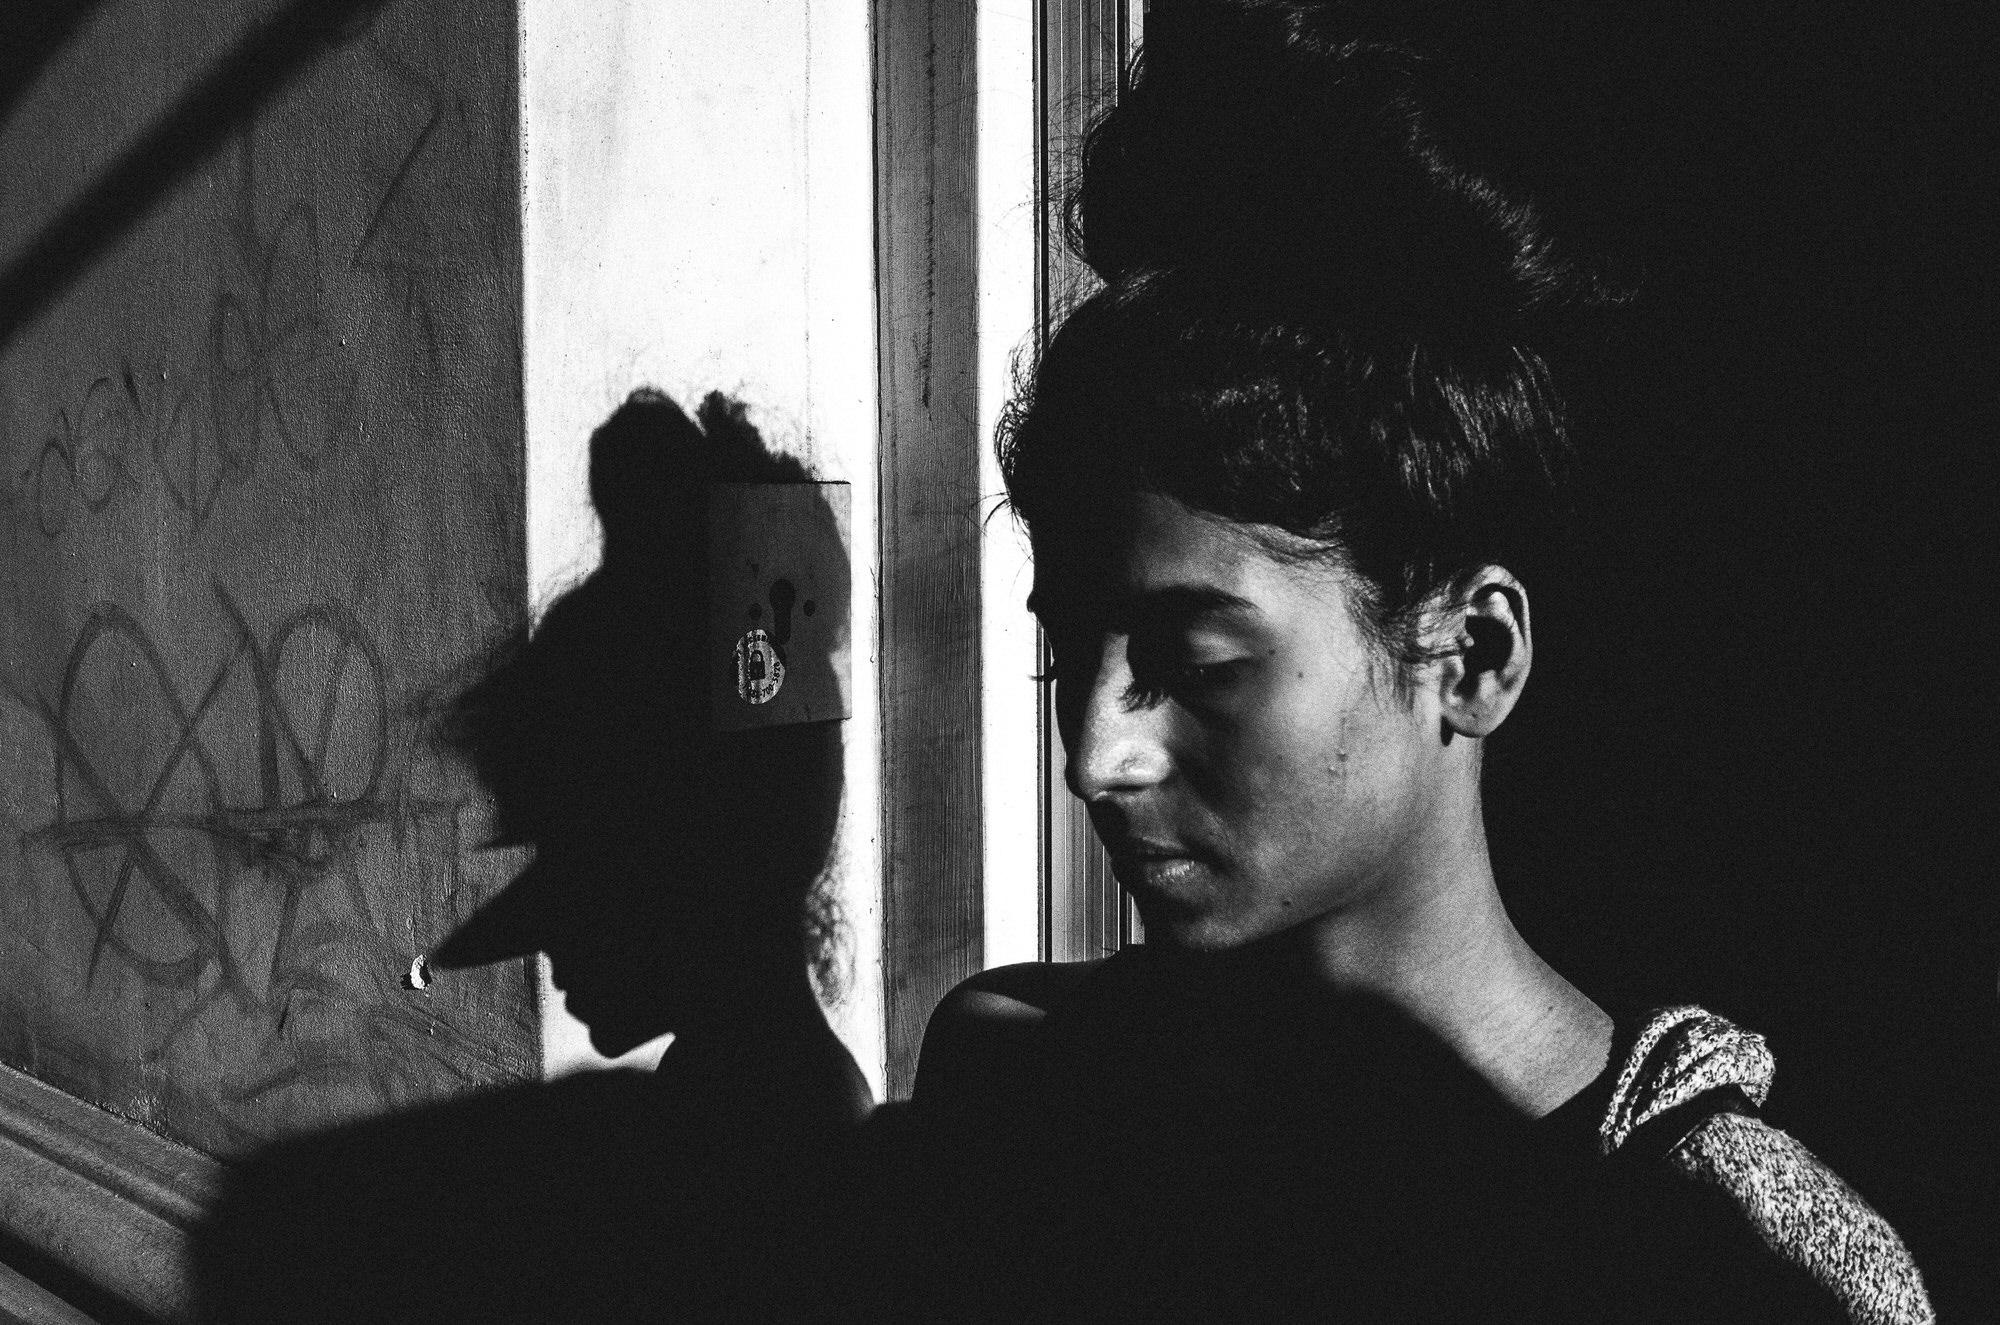 eric kim street photography - the city of angels - black and white-3-pinnochio-shadow-downtown-la.jpg